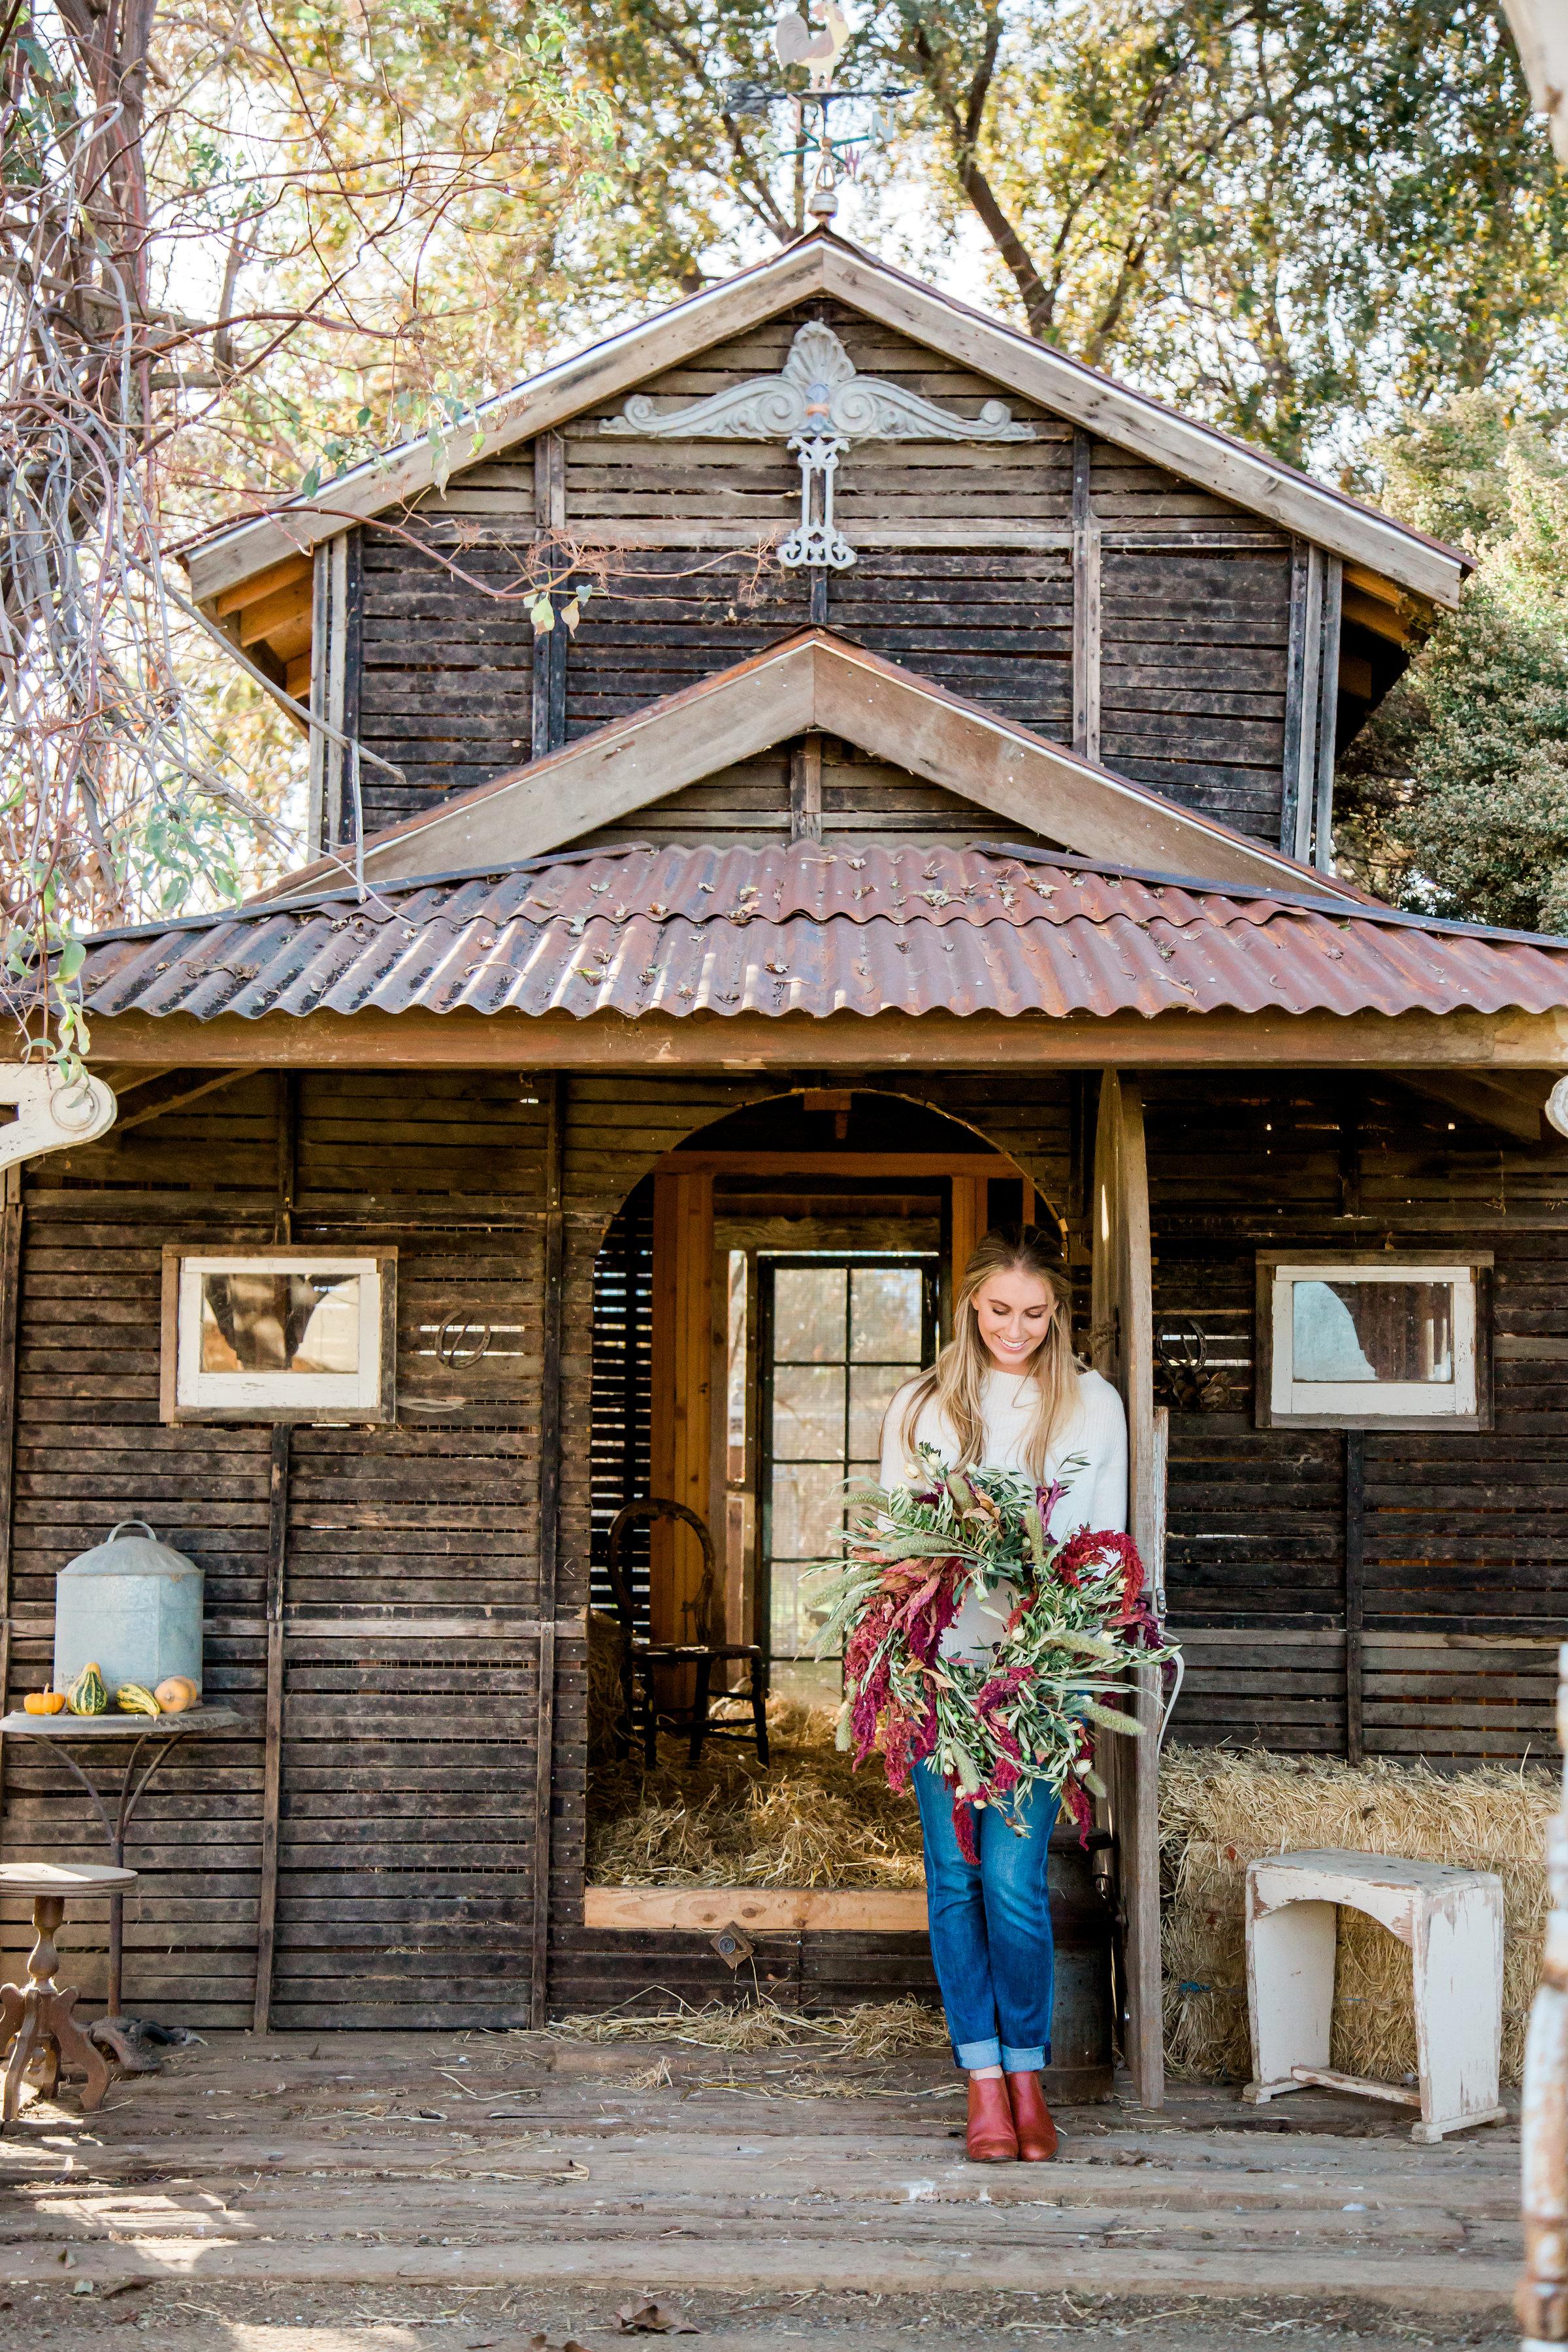 Park Winters Wreath Workshop in Northern California | boxwoodavenue.com